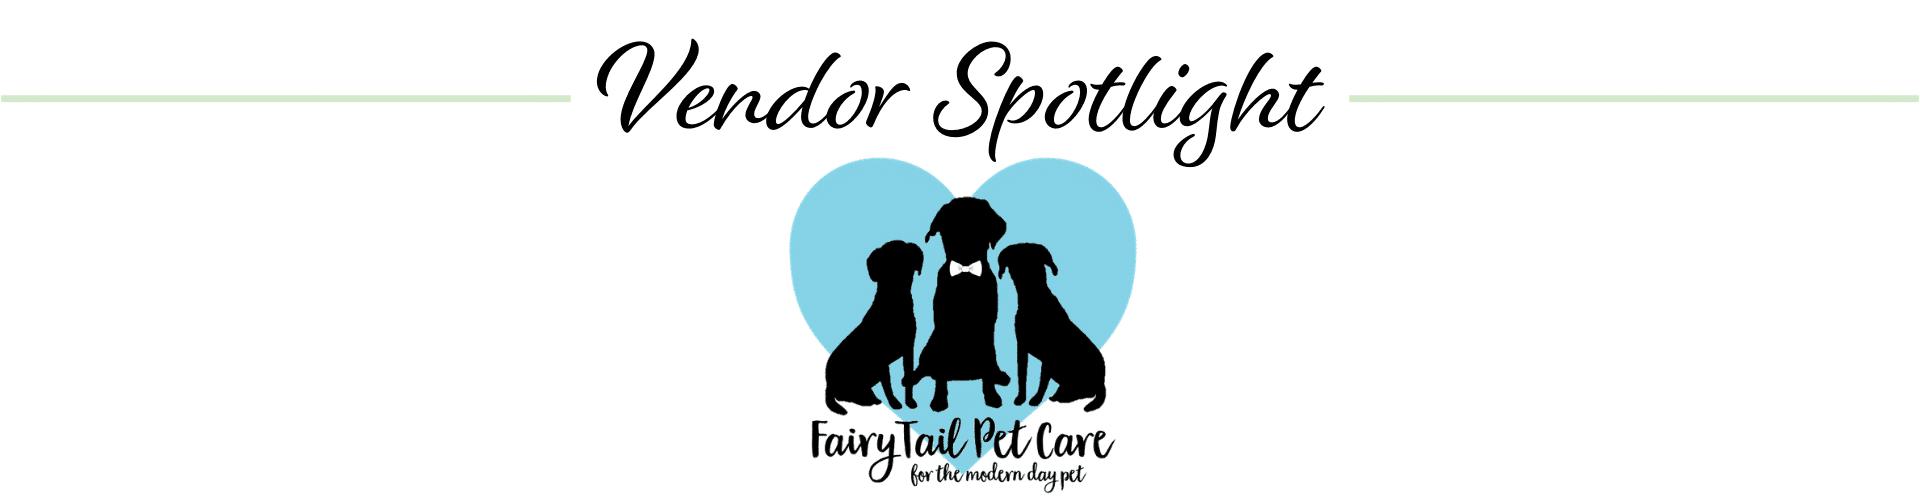 FairyTail Pet Care logo